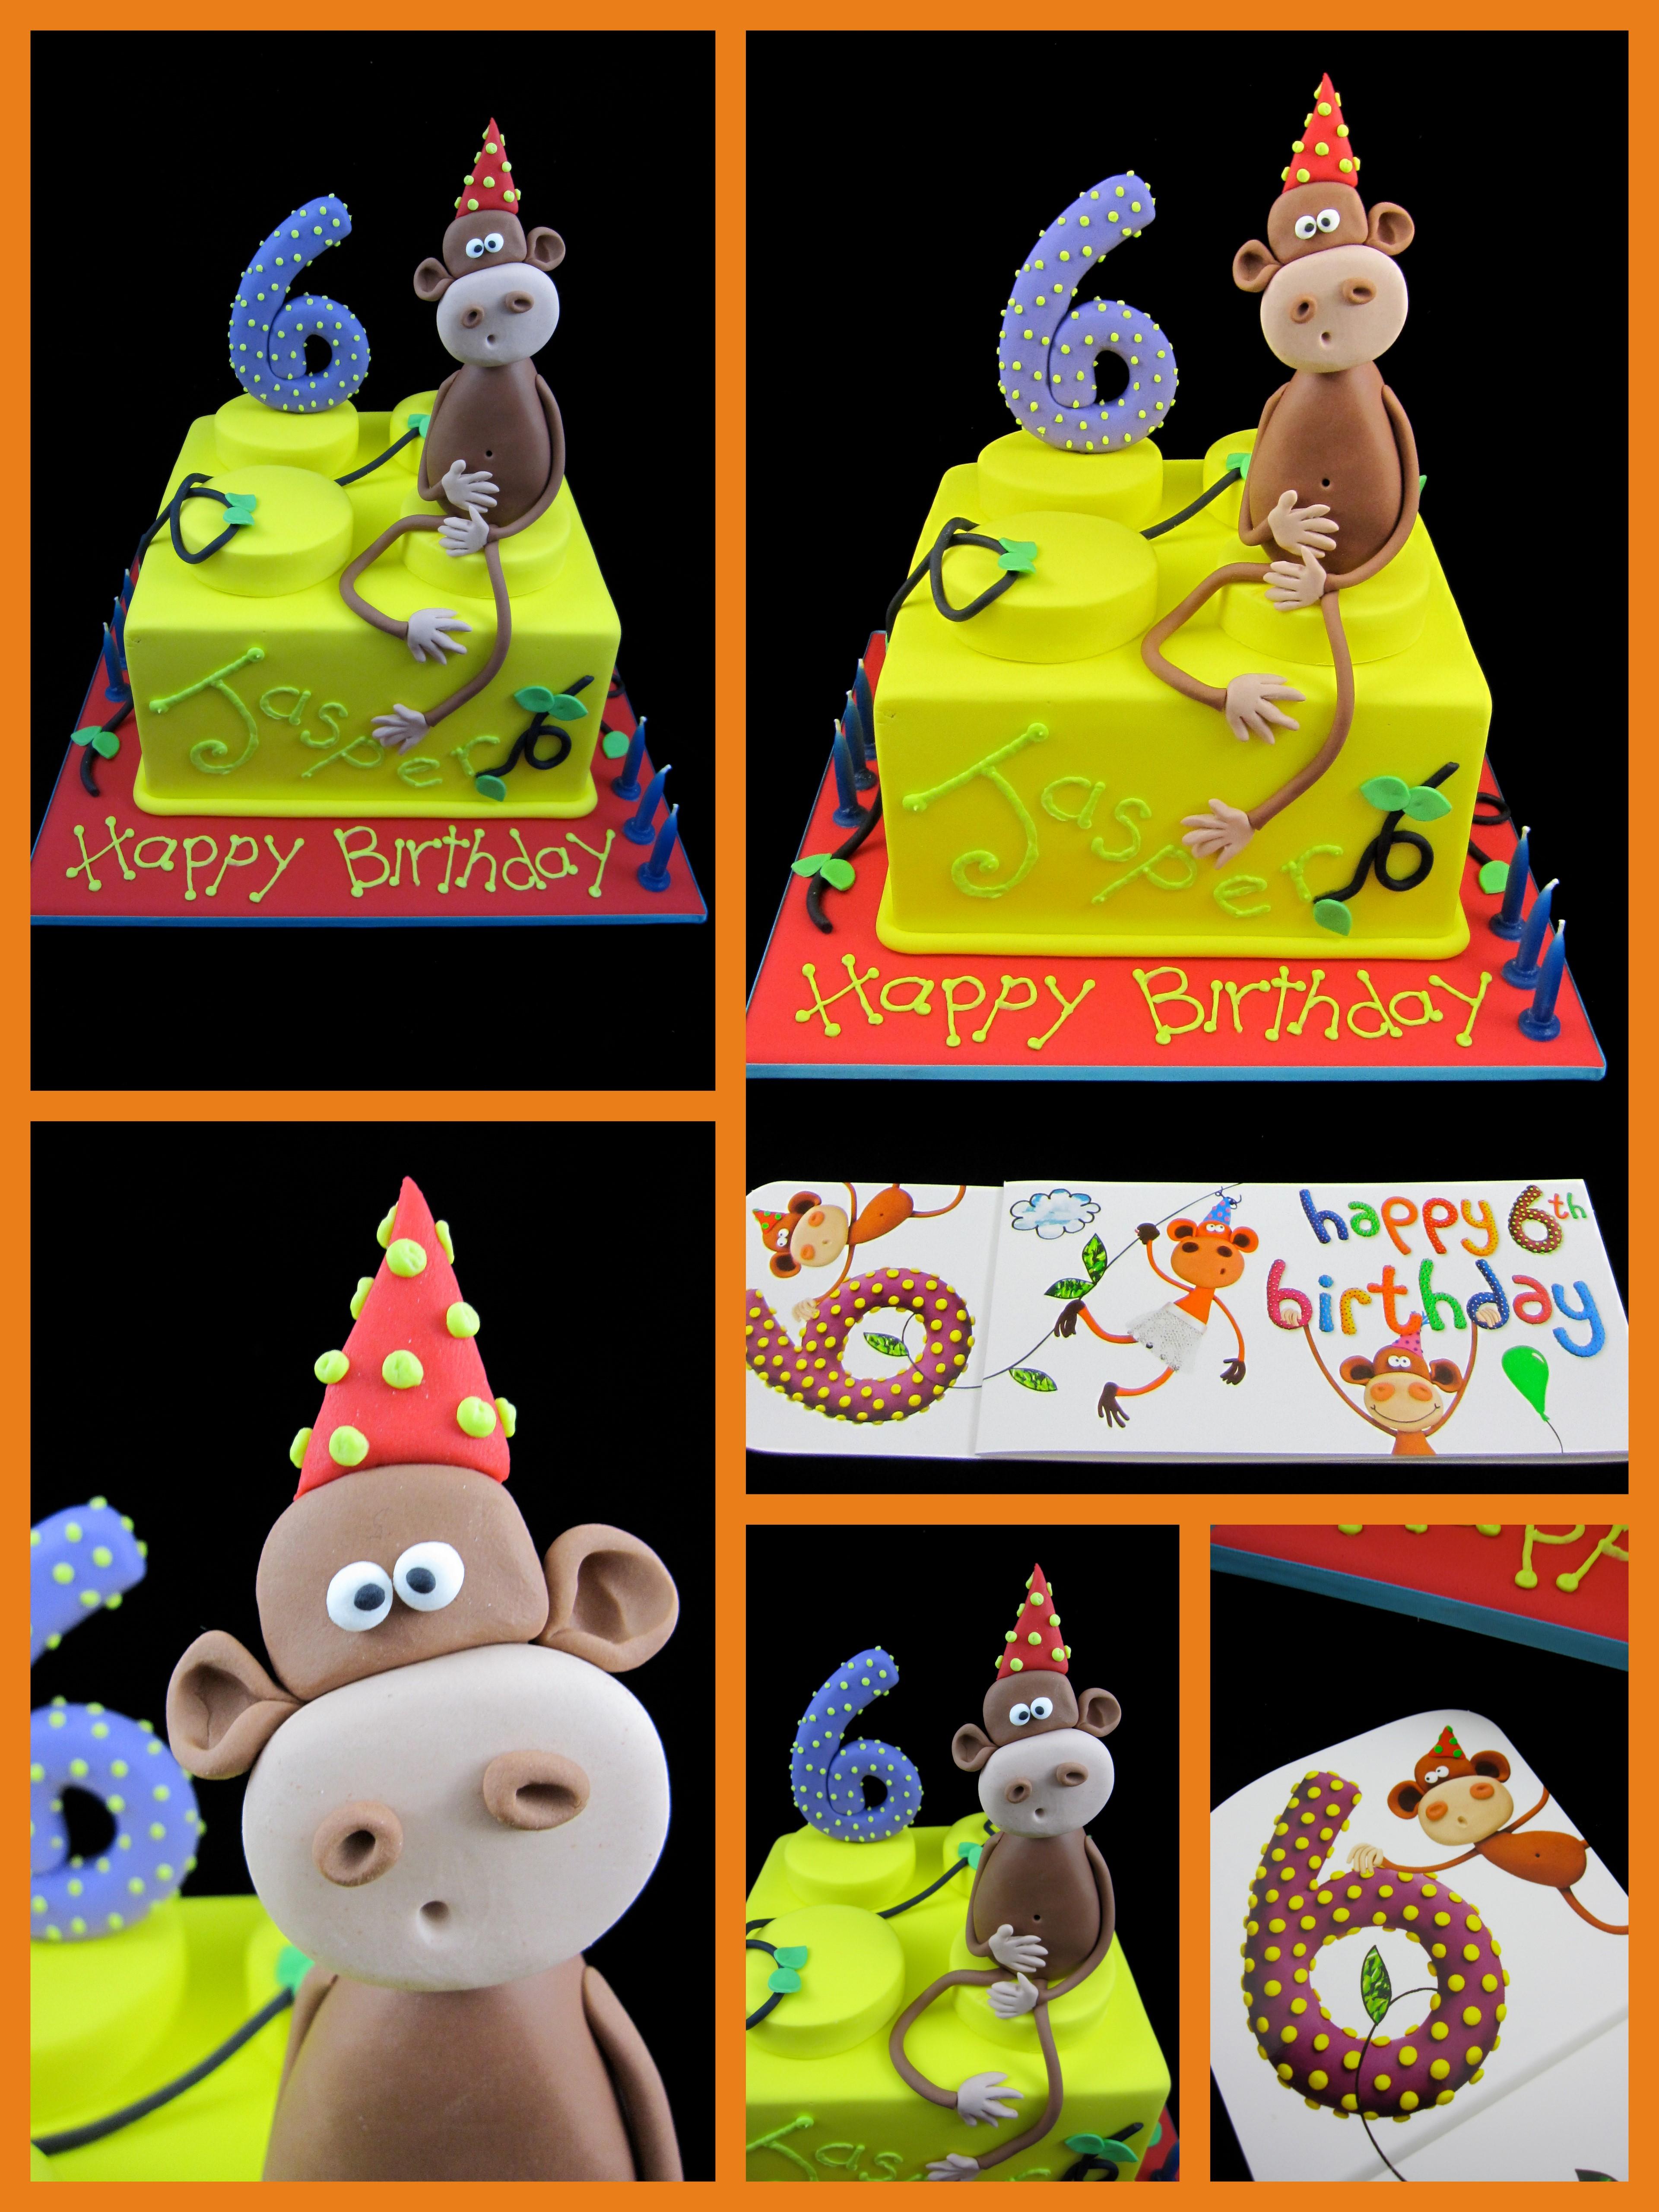 6th Birthday Lego Block Cake Cheeky Monkey Inspired By Michelle Designs